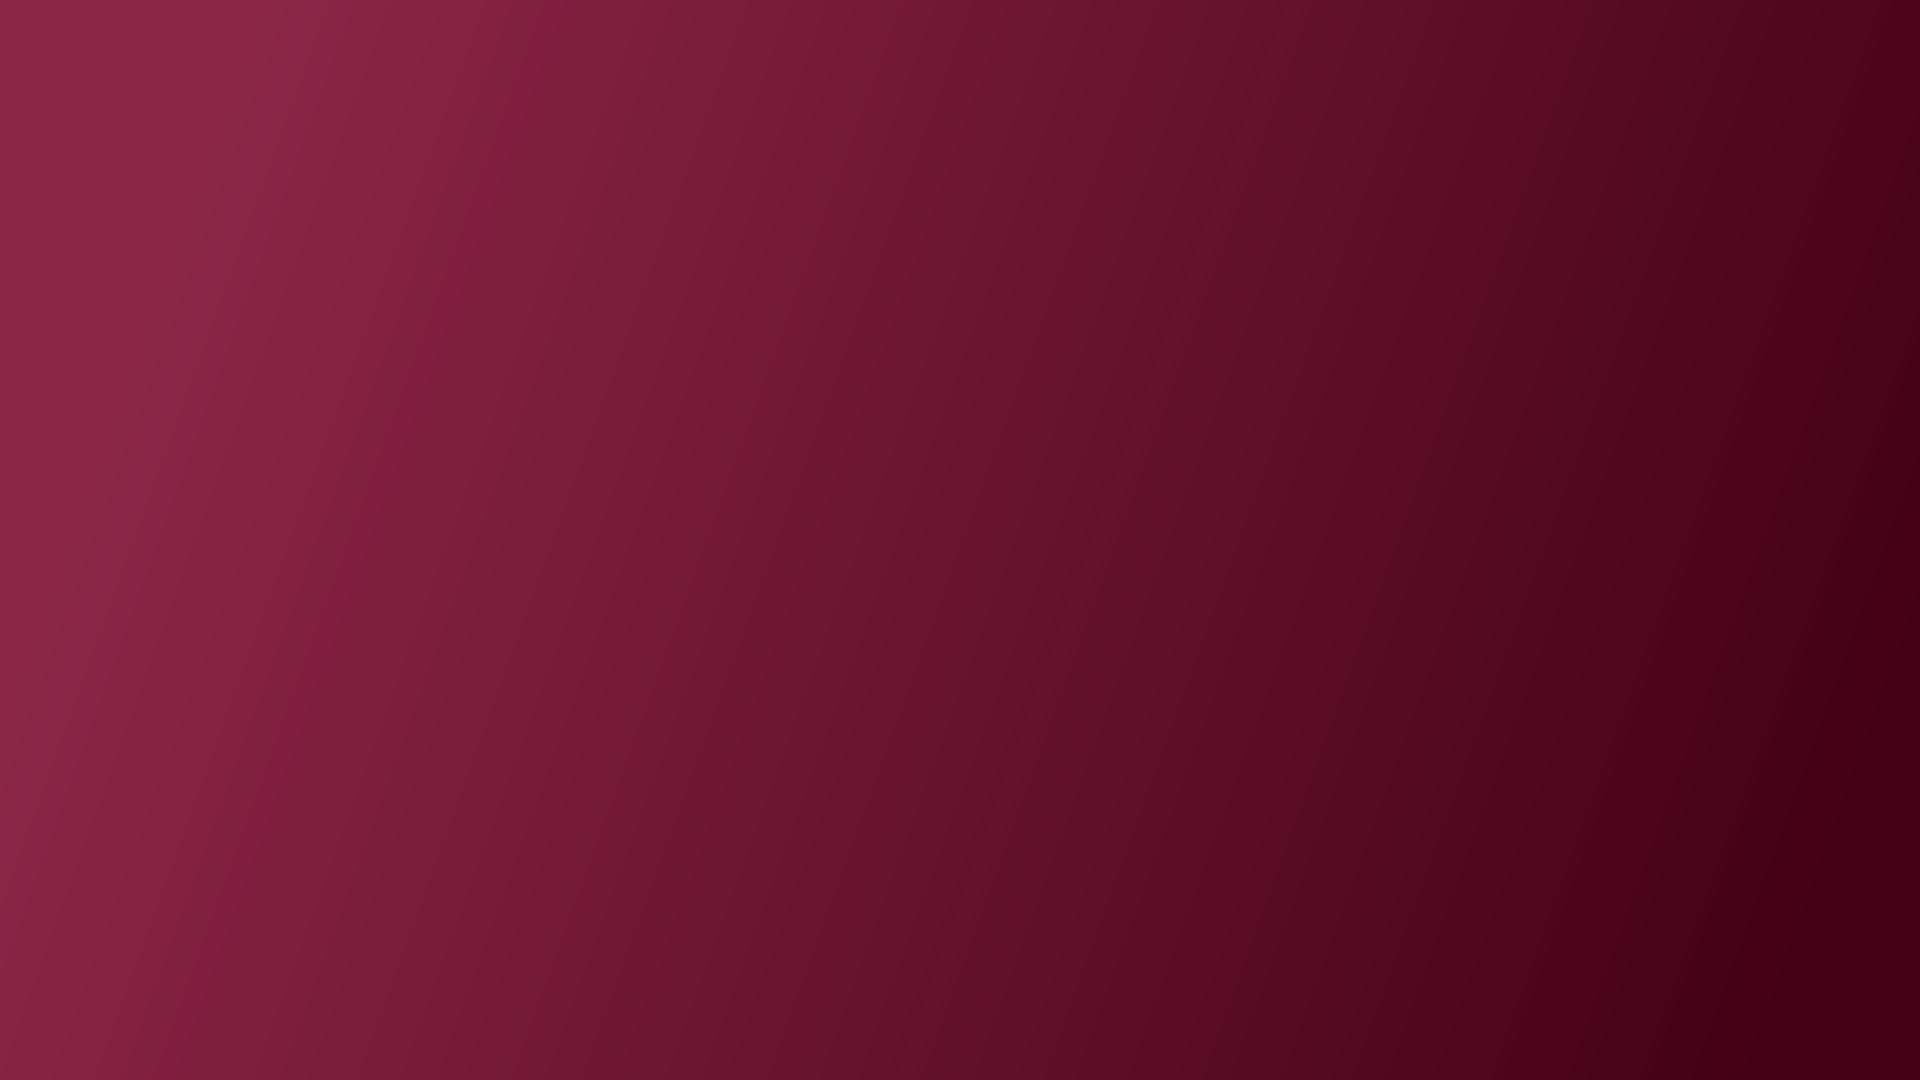 burgundy fade Gradient